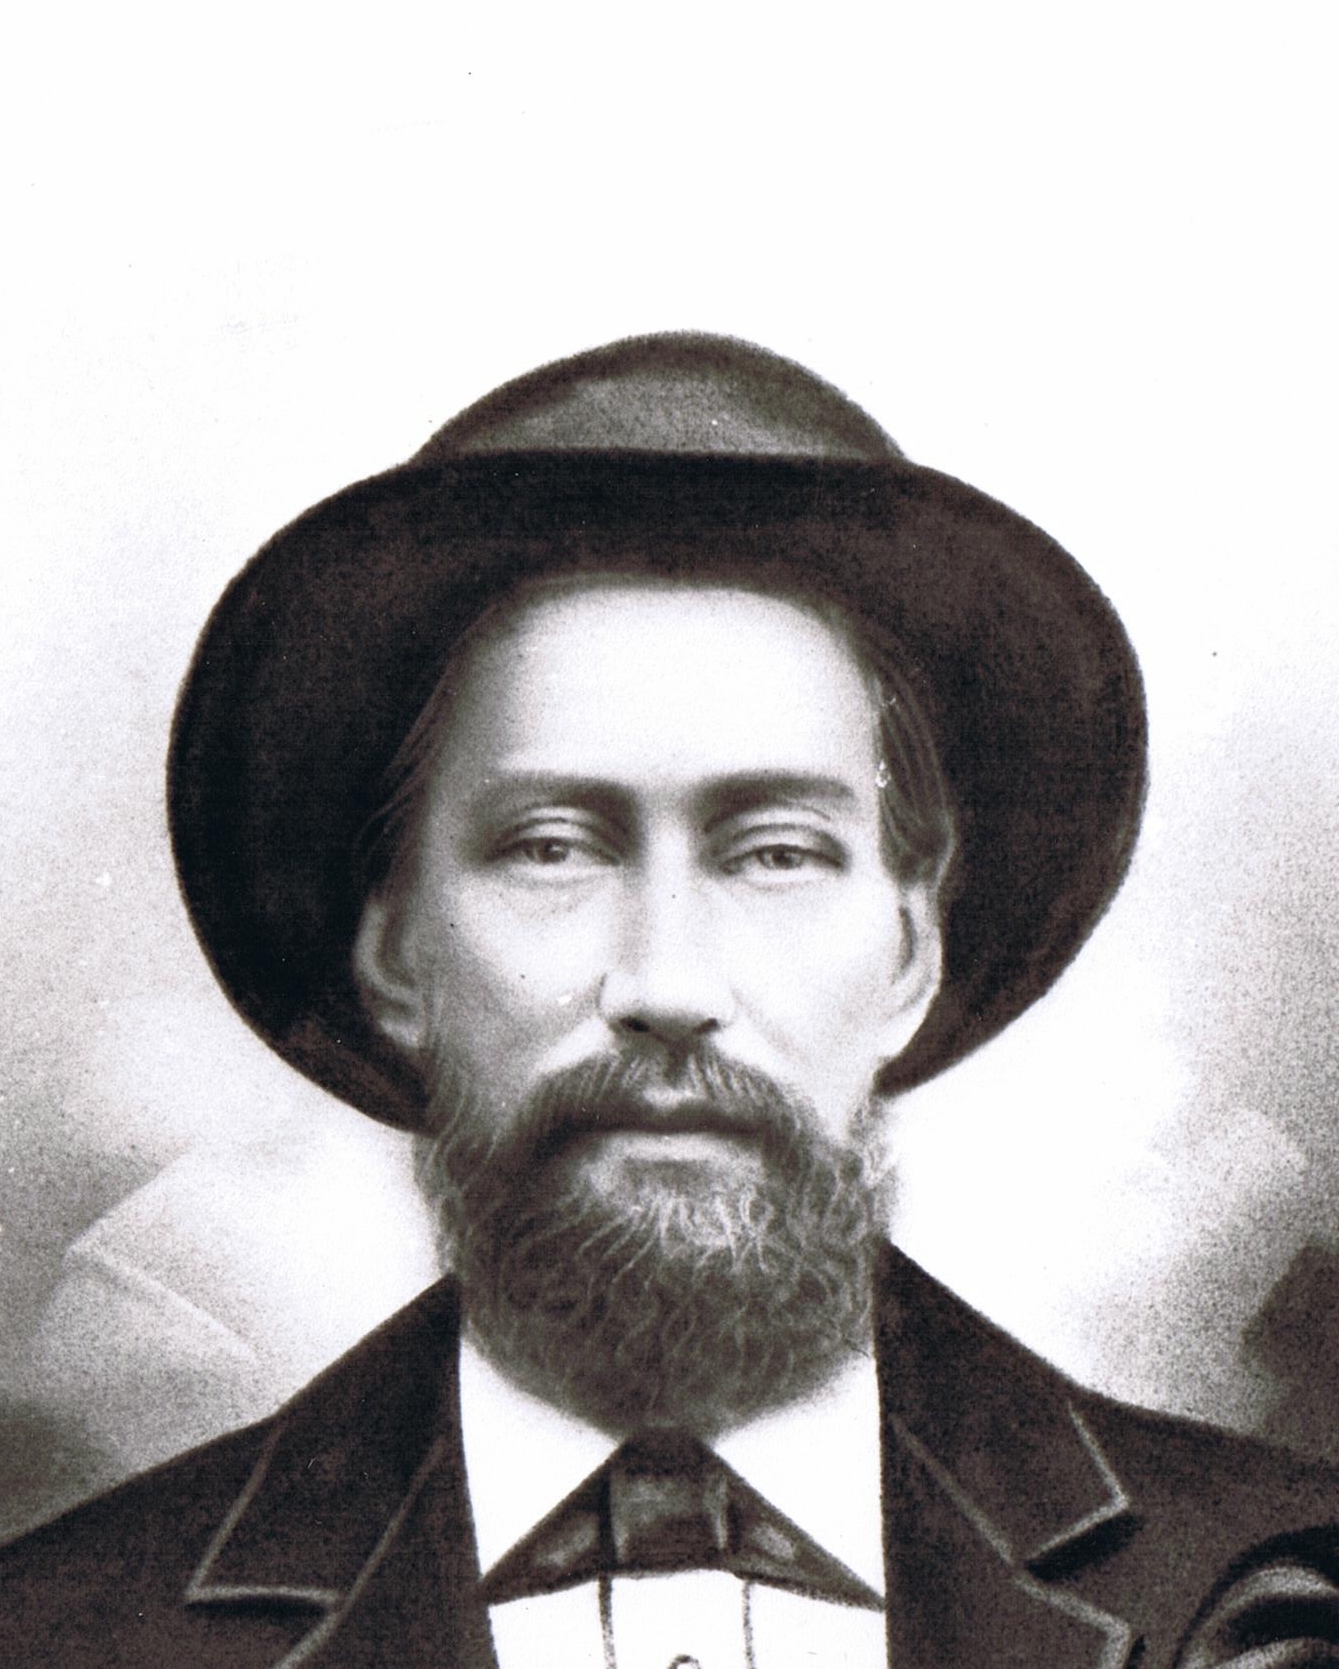 Horton H. Davis